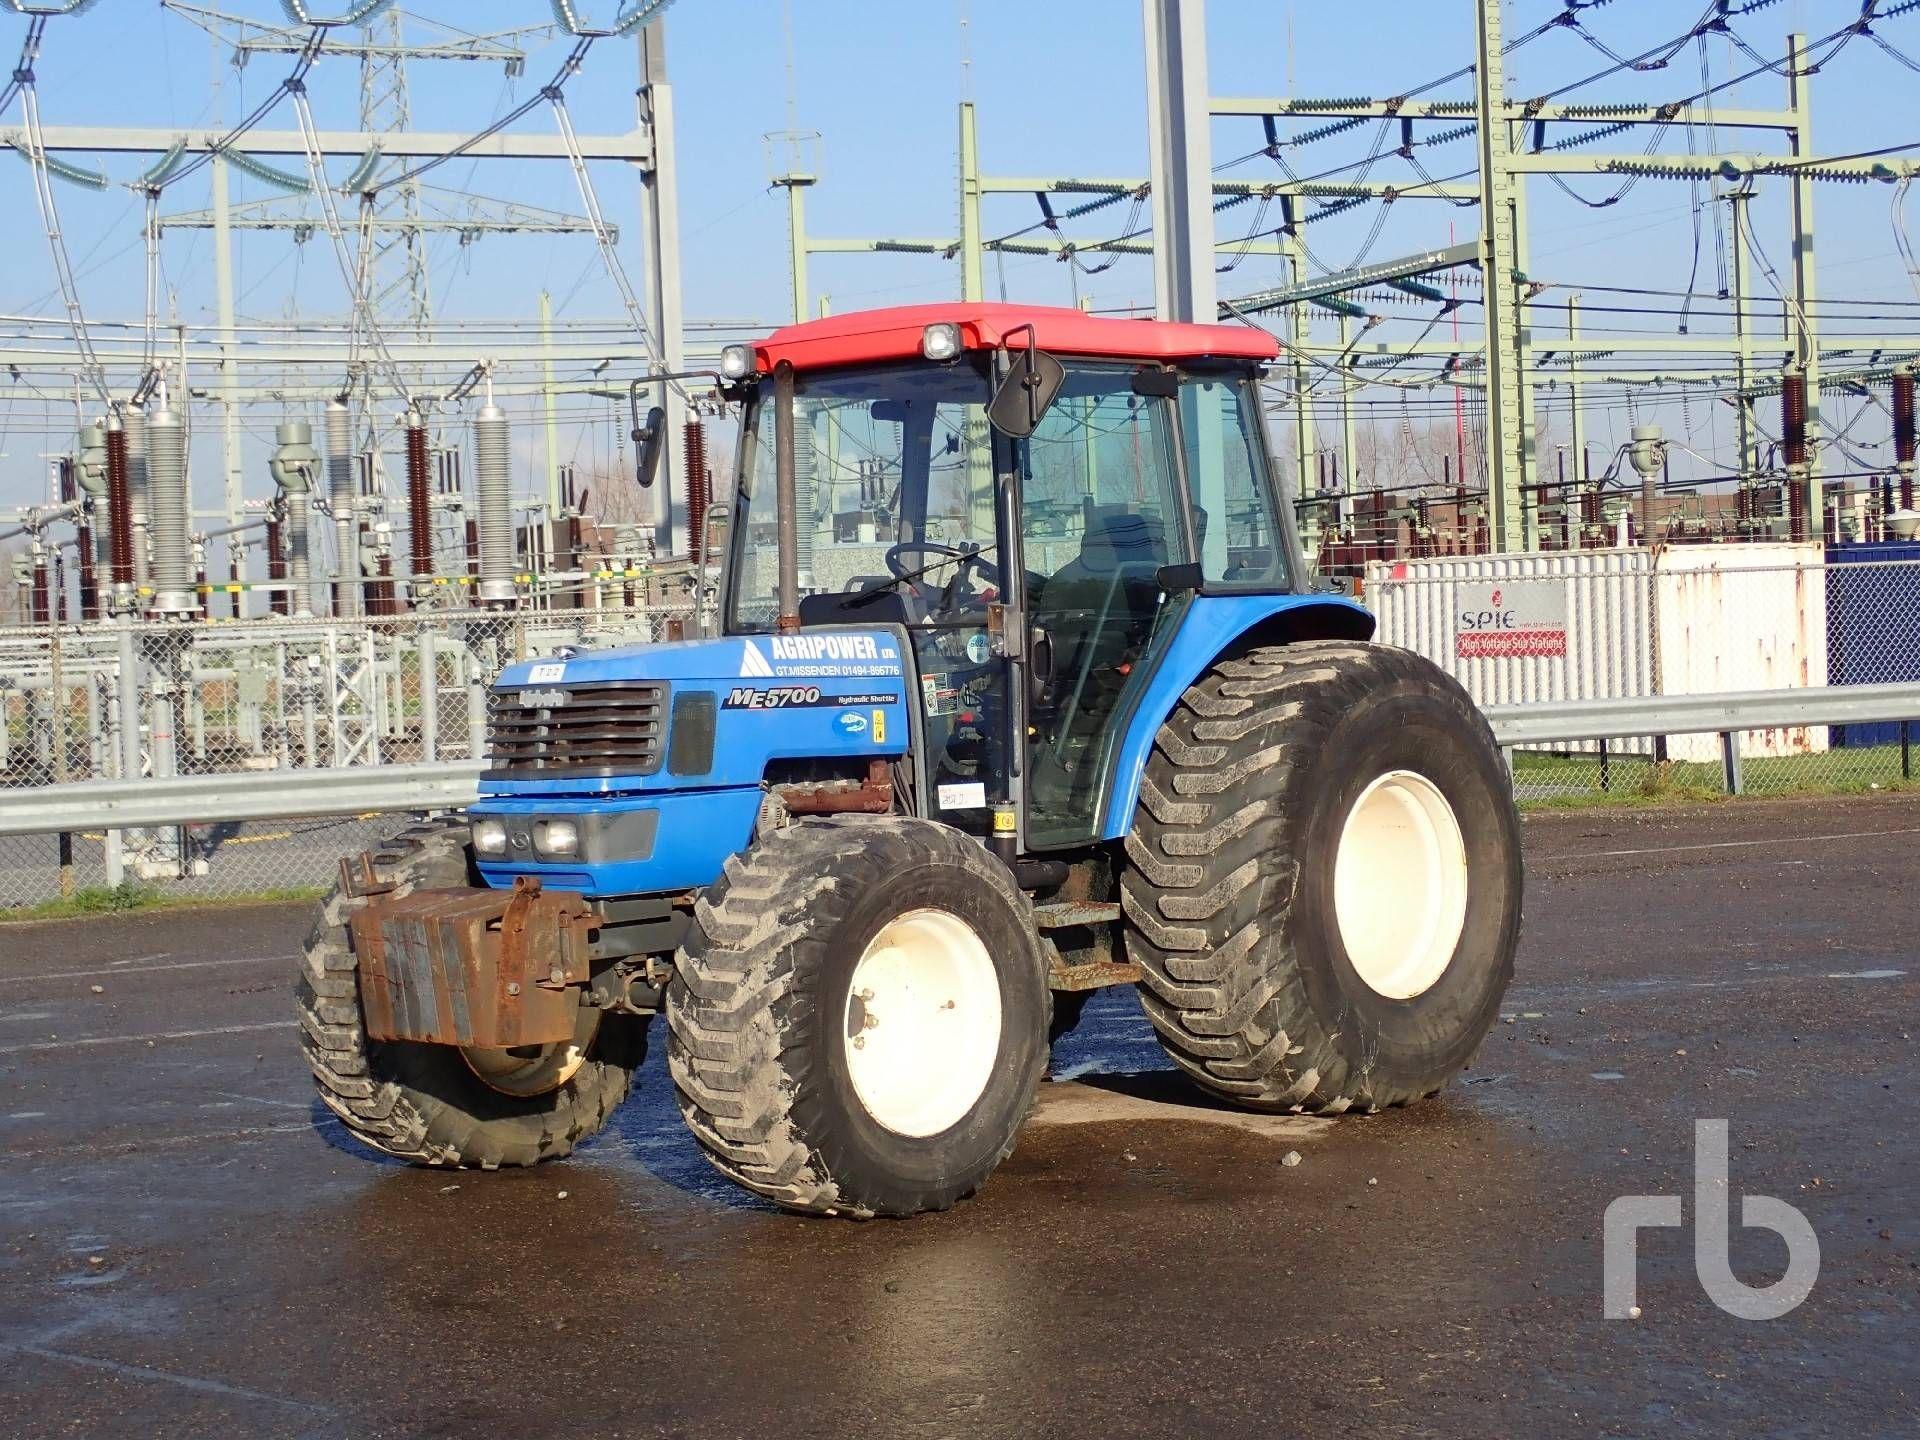 2008 KUBOTA ME5700 4WD Landwirtschaftstraktor MFWD Tractor Lot # 976